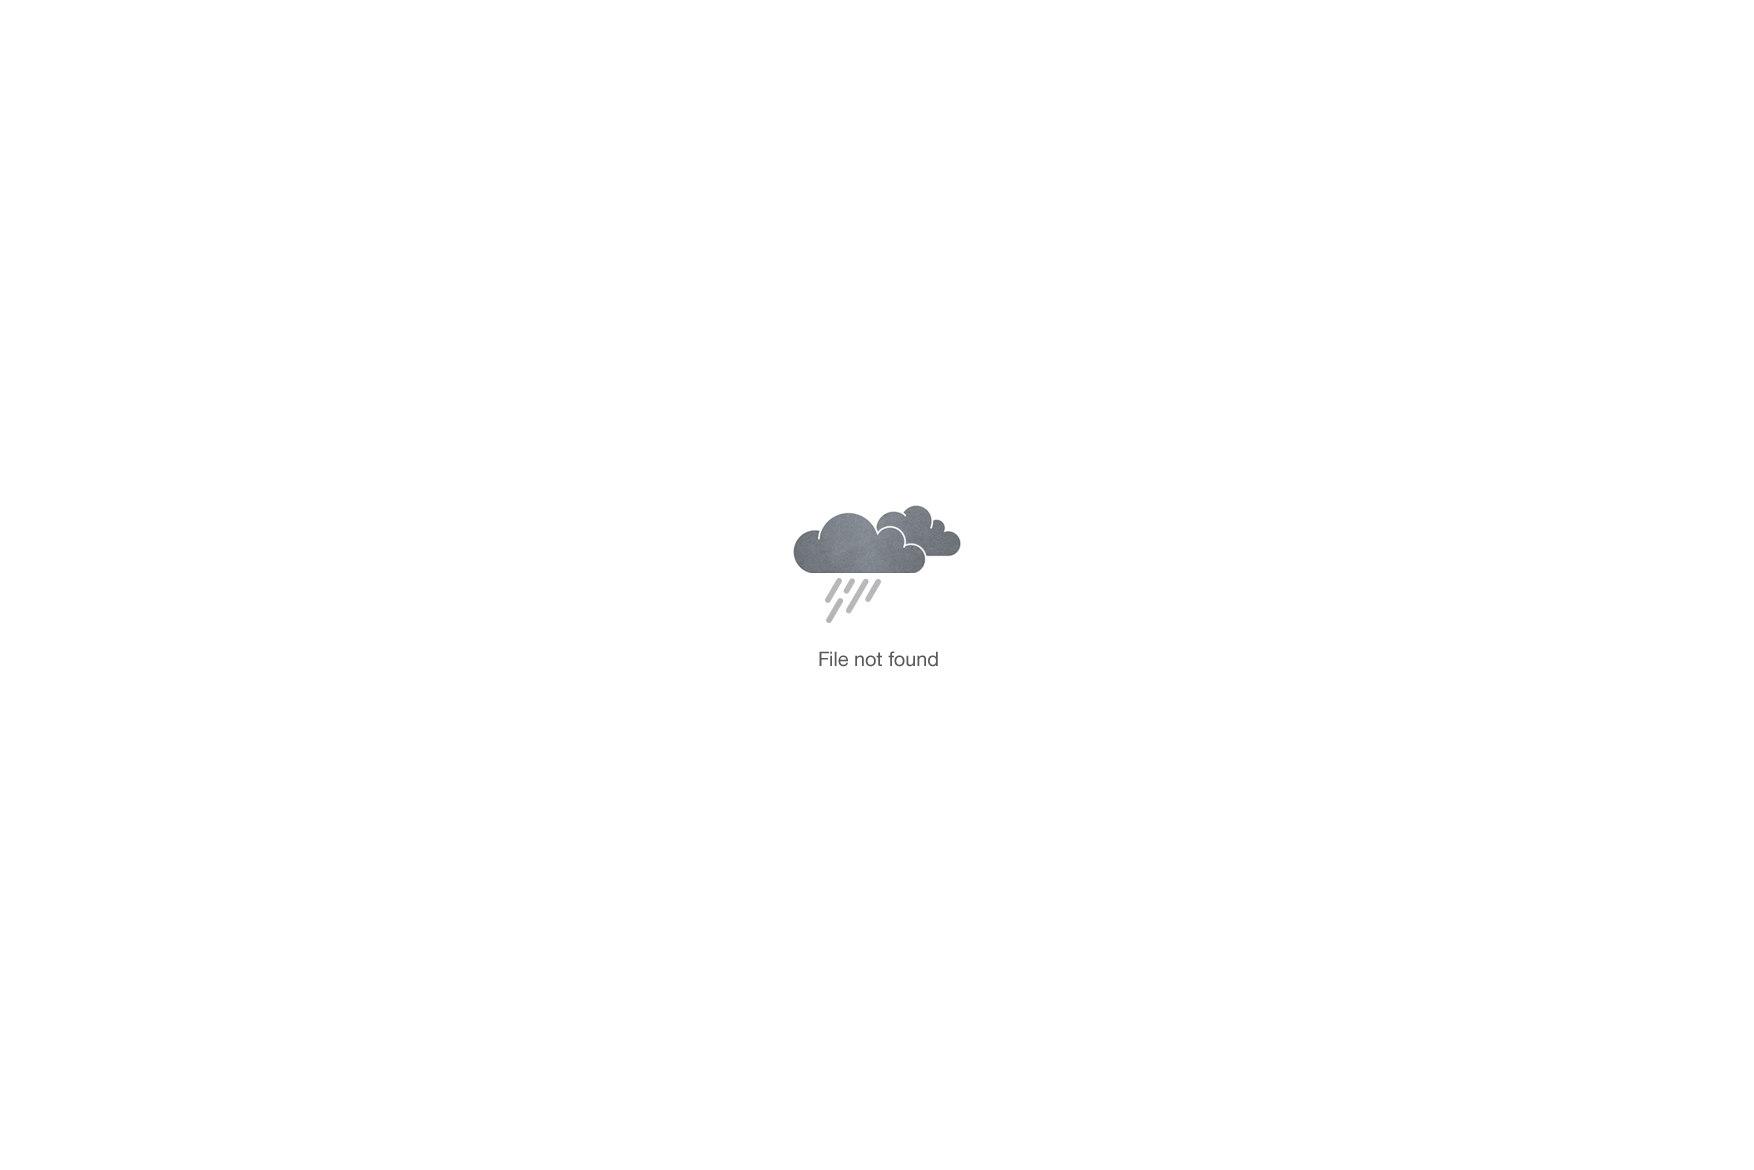 stephane-parisse-Rugby-Sponsorise-me-image-3